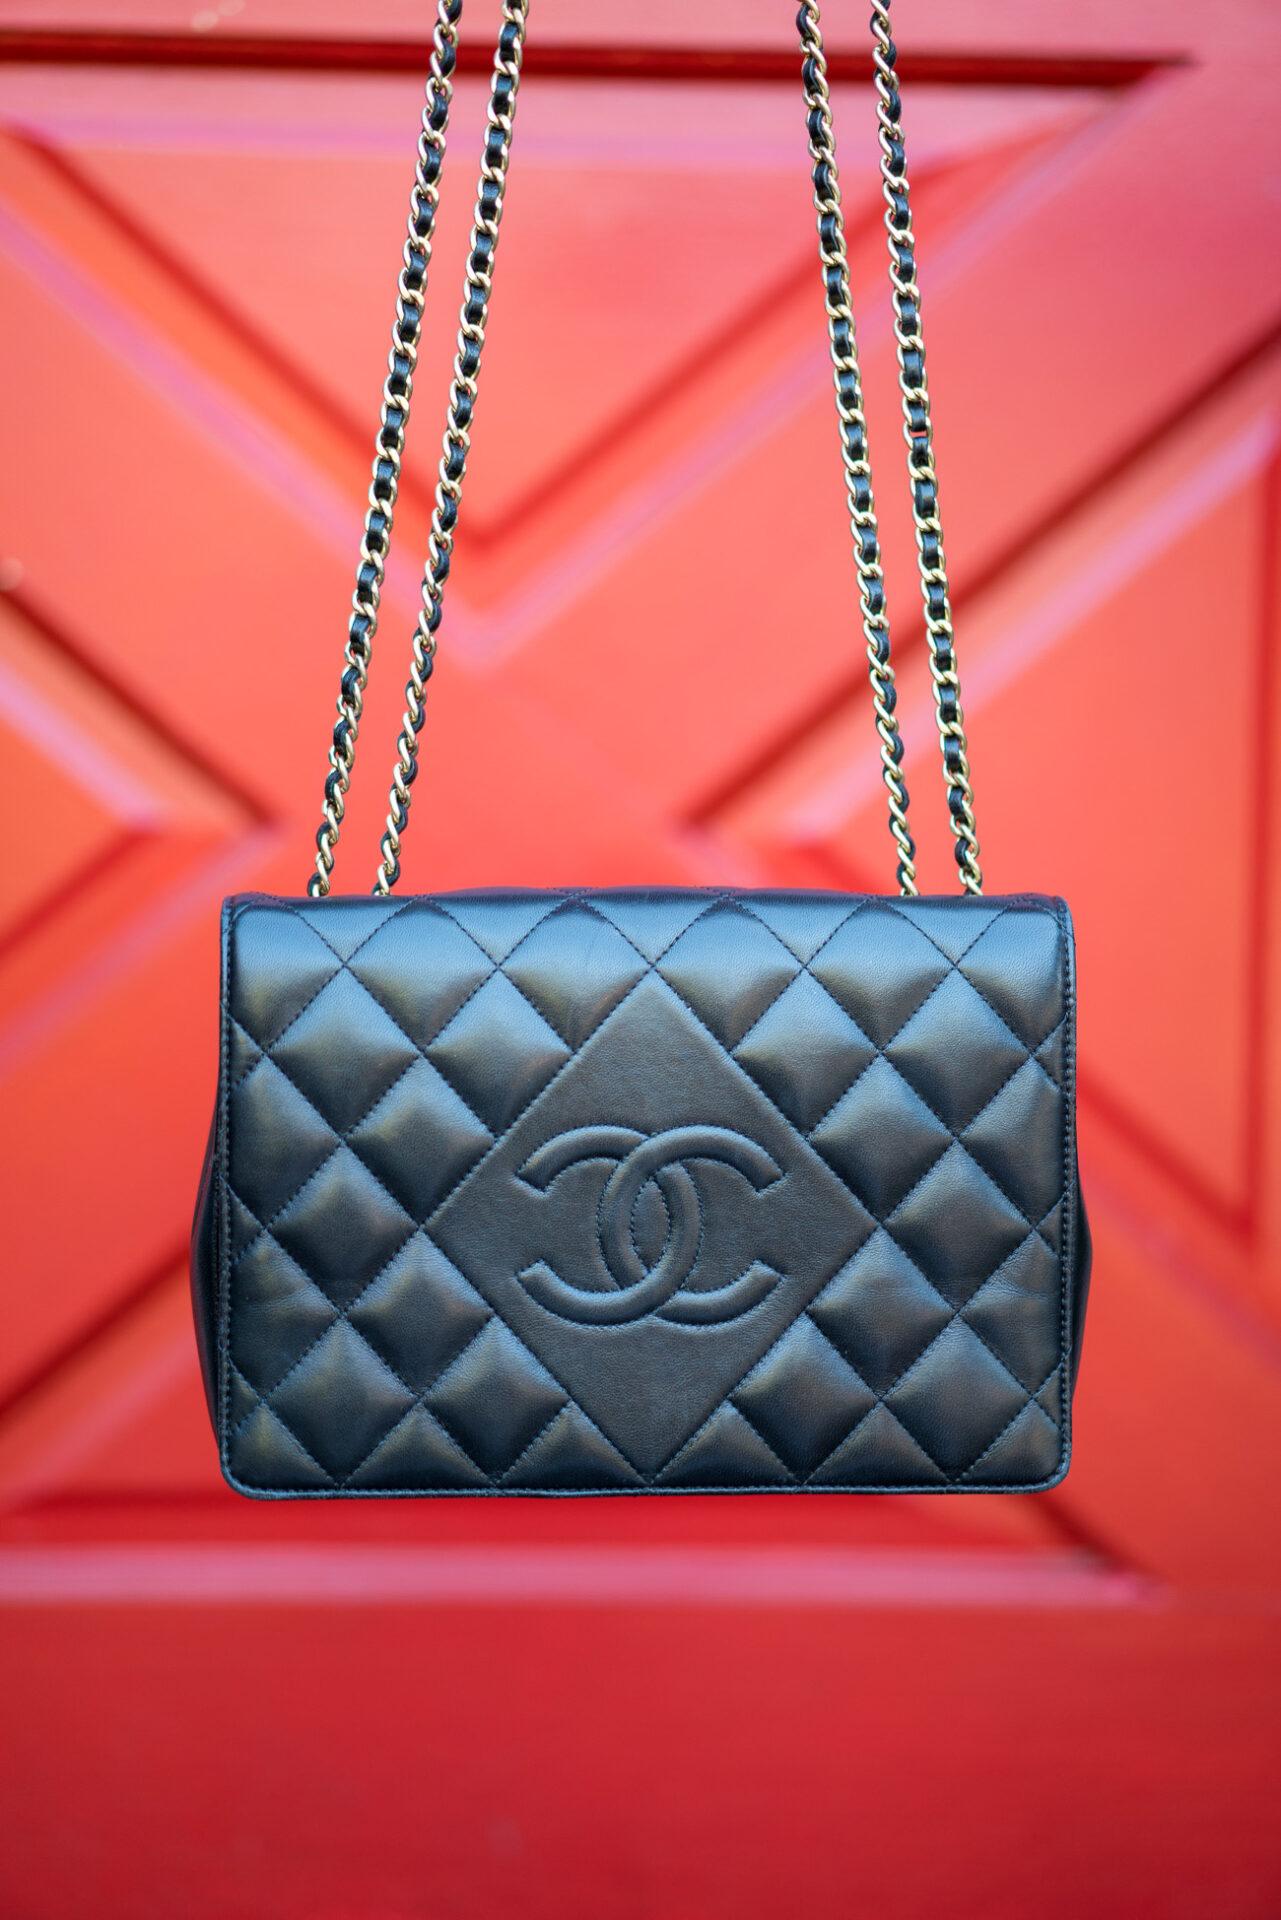 Chanel Diamond CC Flap Bag Angela Lanter Hello Gorgeous